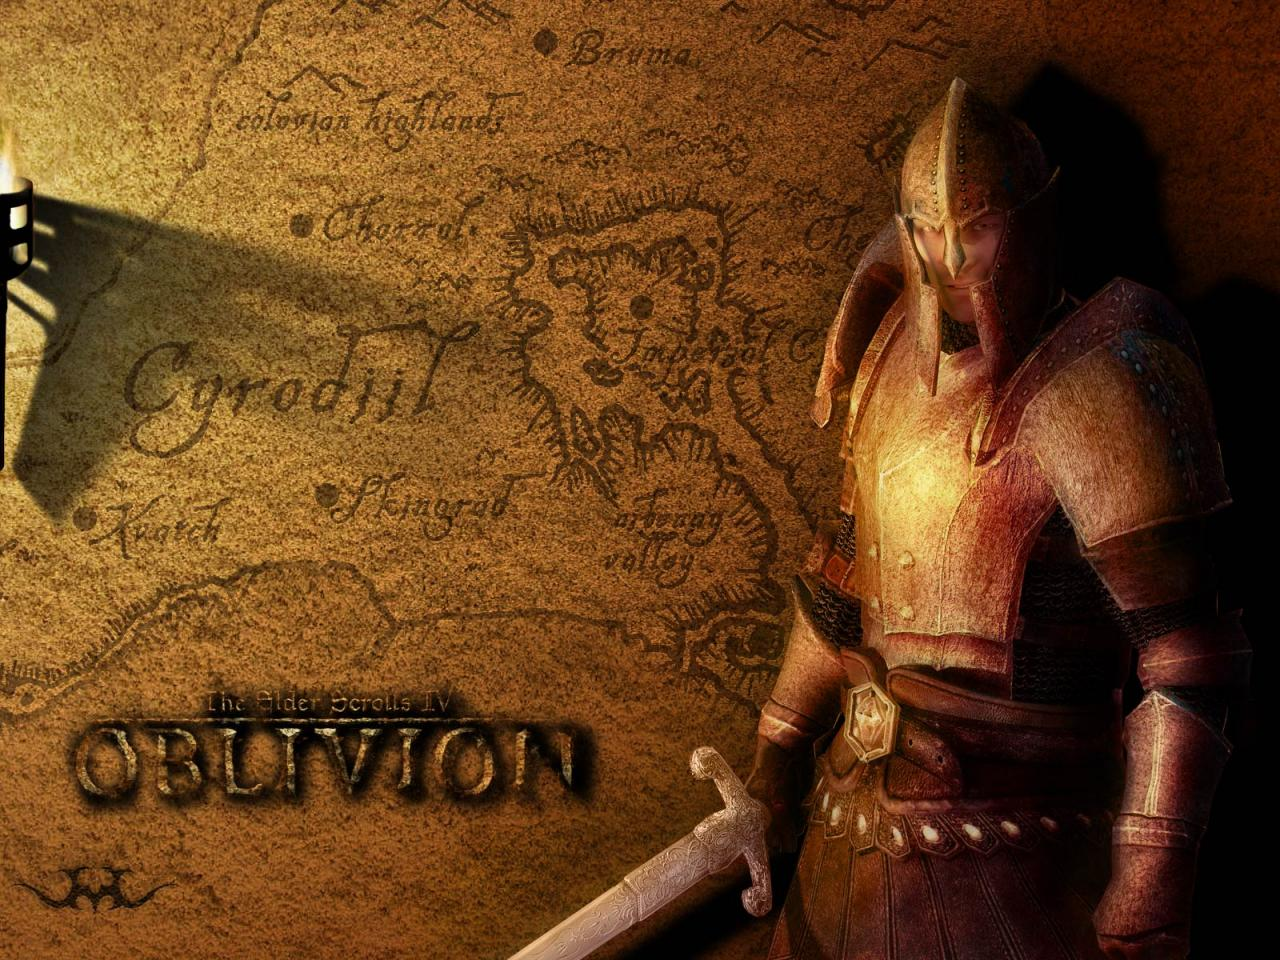 The Elder Scrolls IV: Oblivion coloring #8, Download drawings